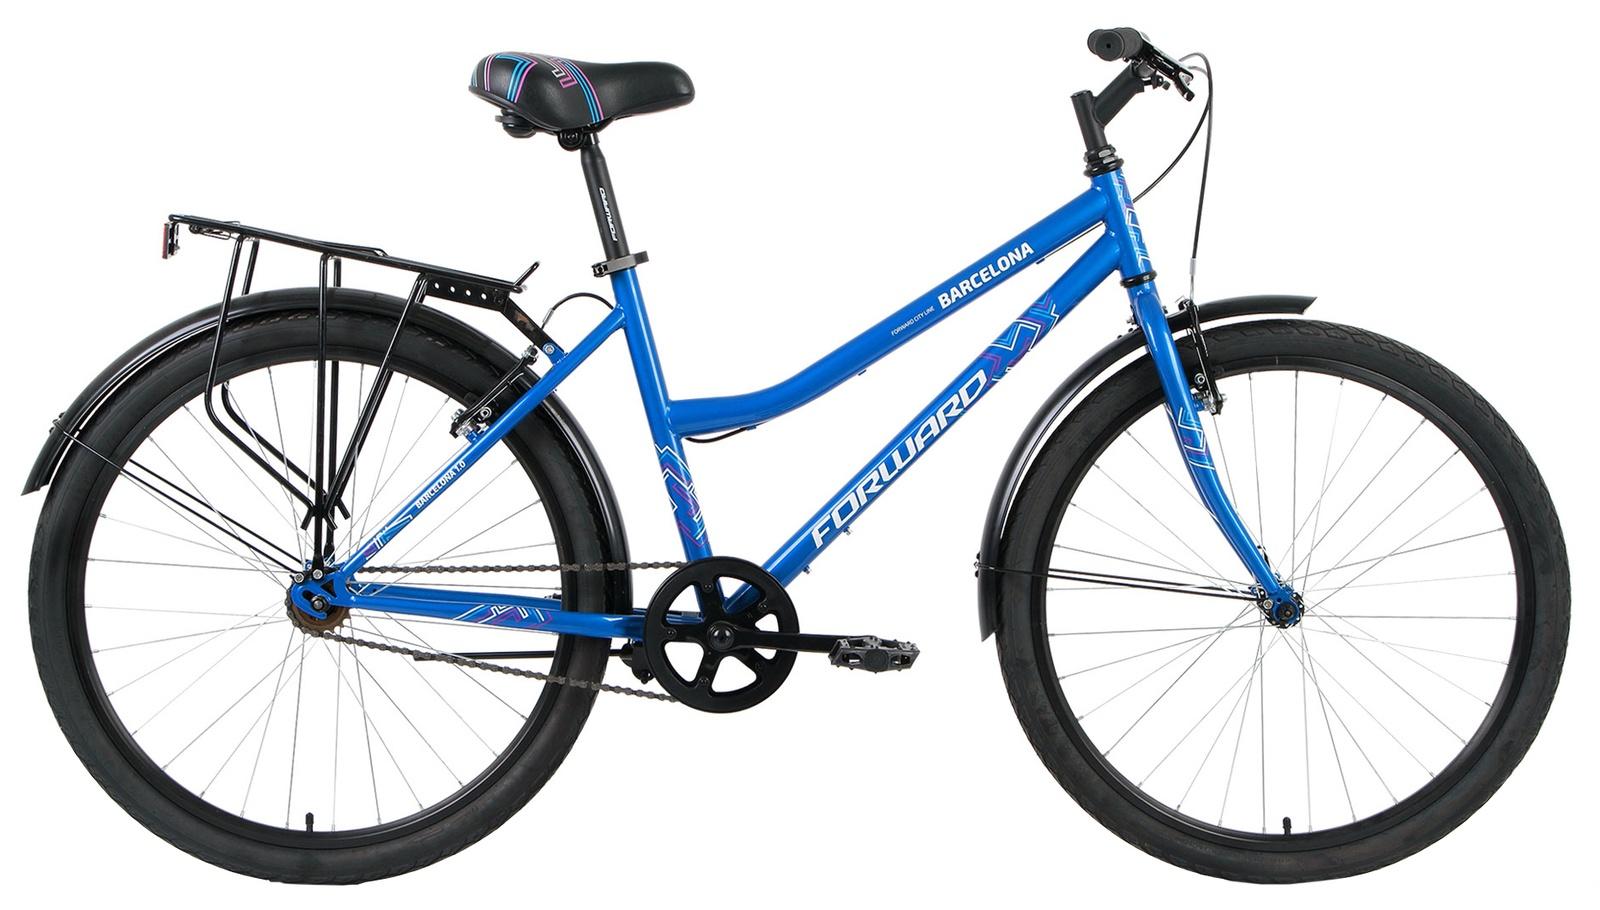 Дорожный Forward Barcelona 1.0, RBKW7UN61002, синий велосипед forward barcelona 1 0 2017 1 скорость рама 17 синий